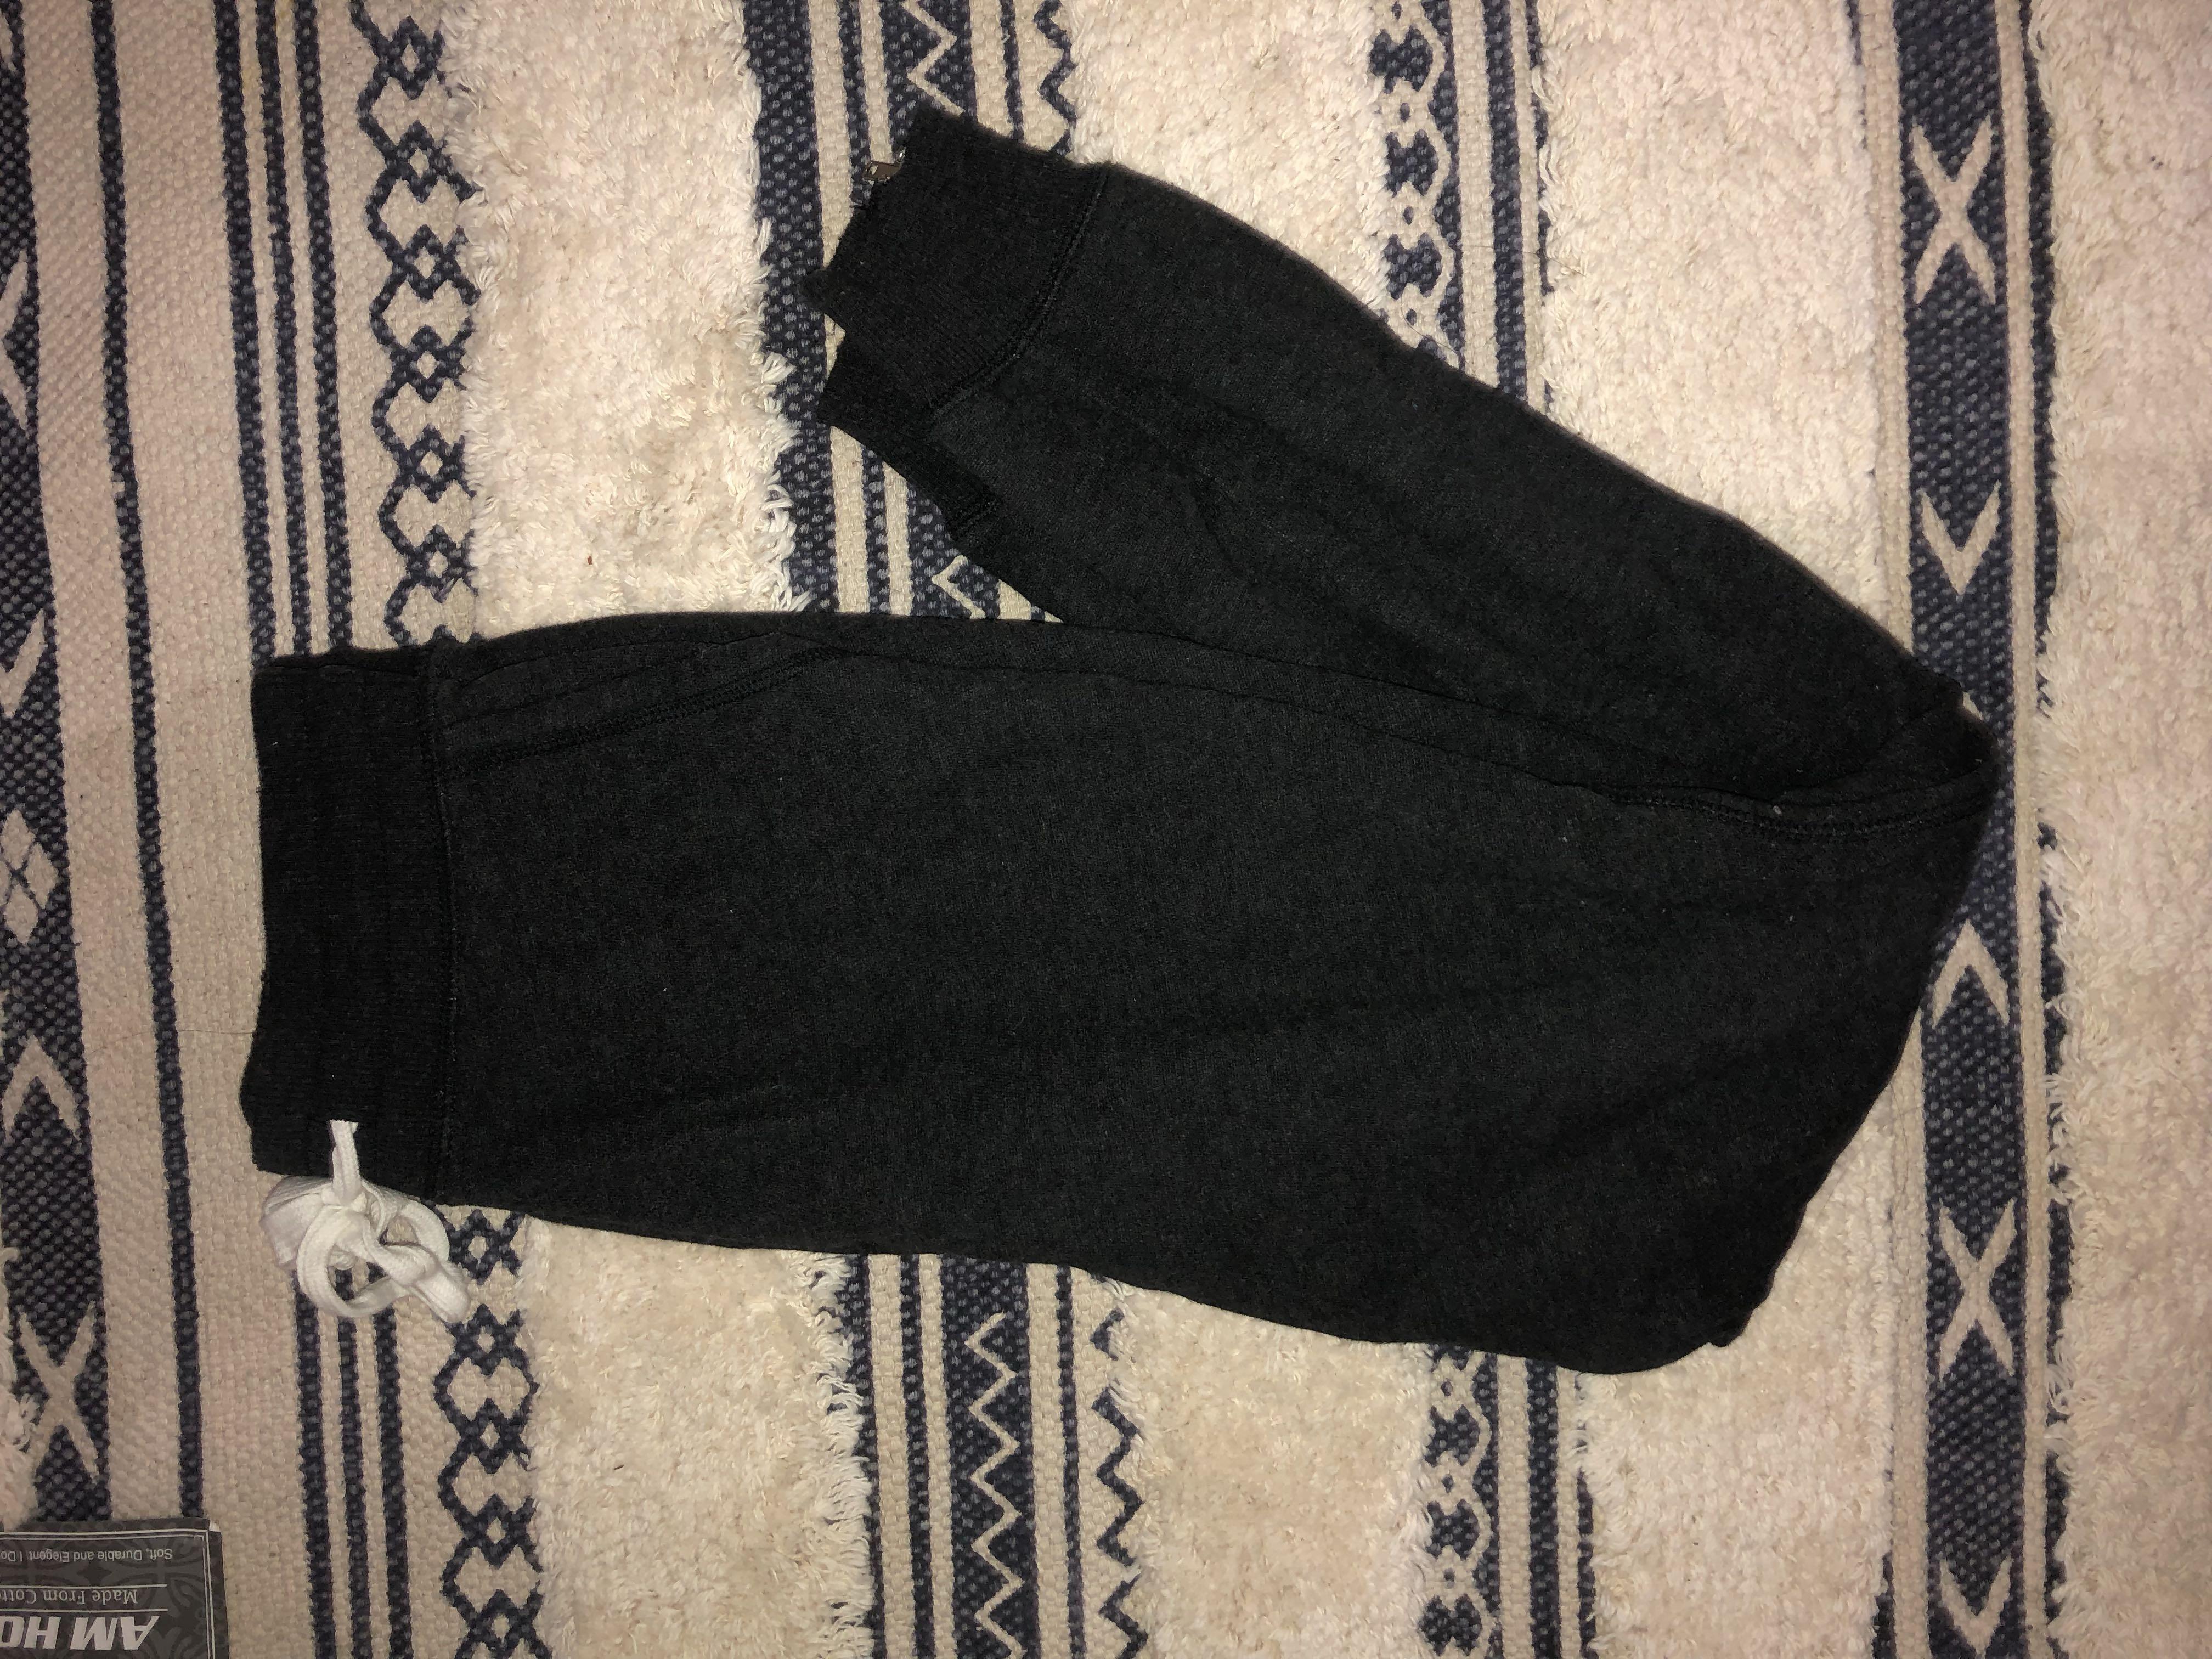 Arie jogger with zipper xs dark gray